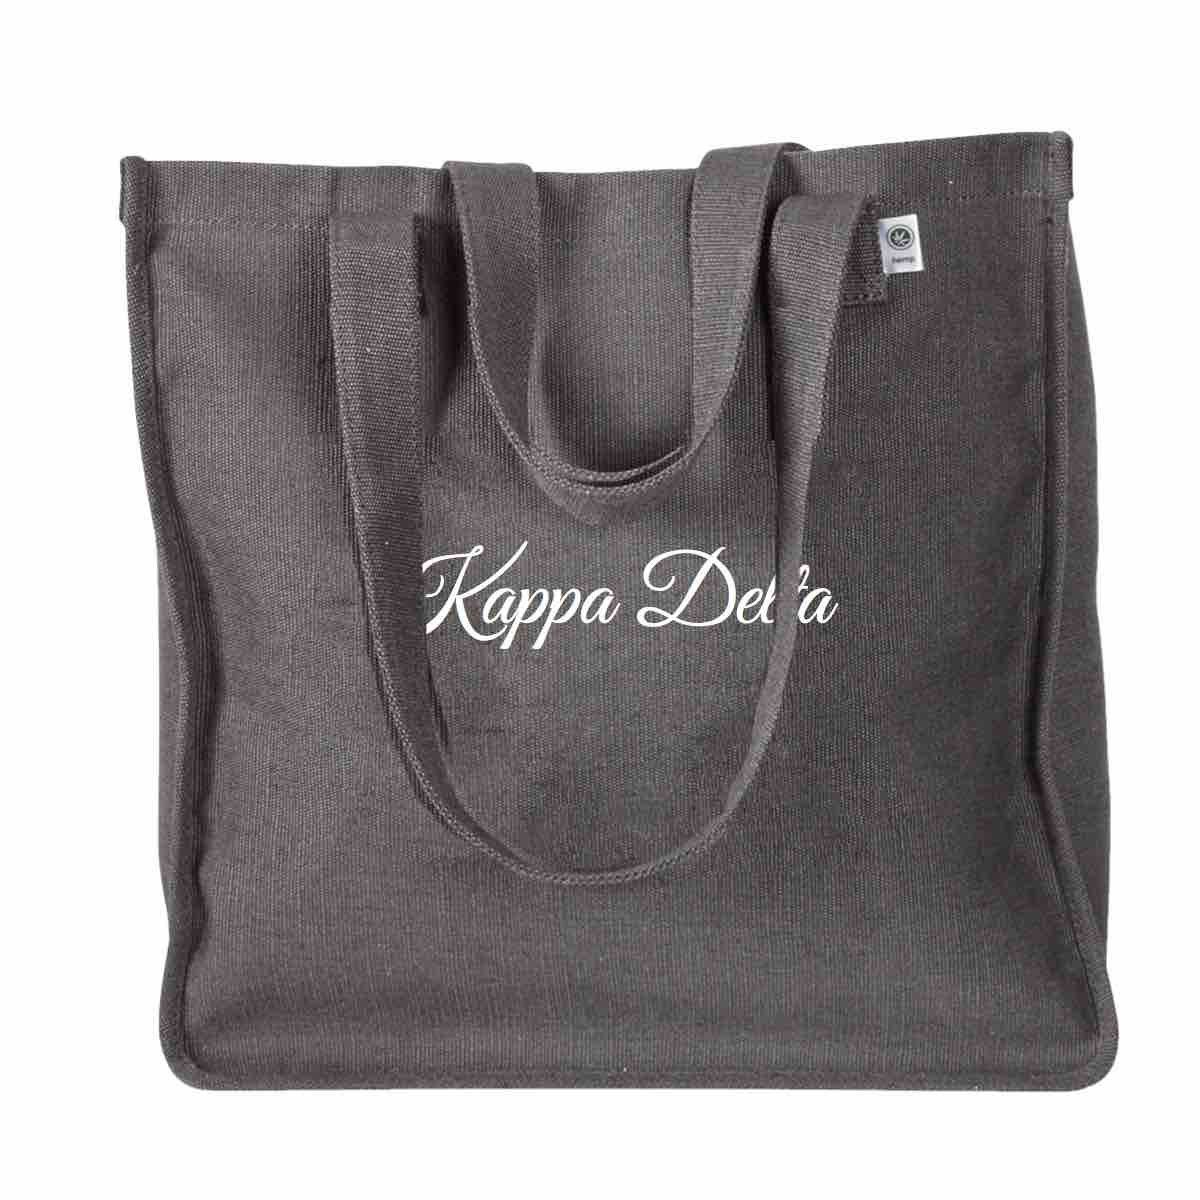 Now available Kappa Delta Hemp ... Shop http://manddsororitygifts.com/products/kappa-delta-bag-grey?utm_campaign=social_autopilot&utm_source=pin&utm_medium=pin